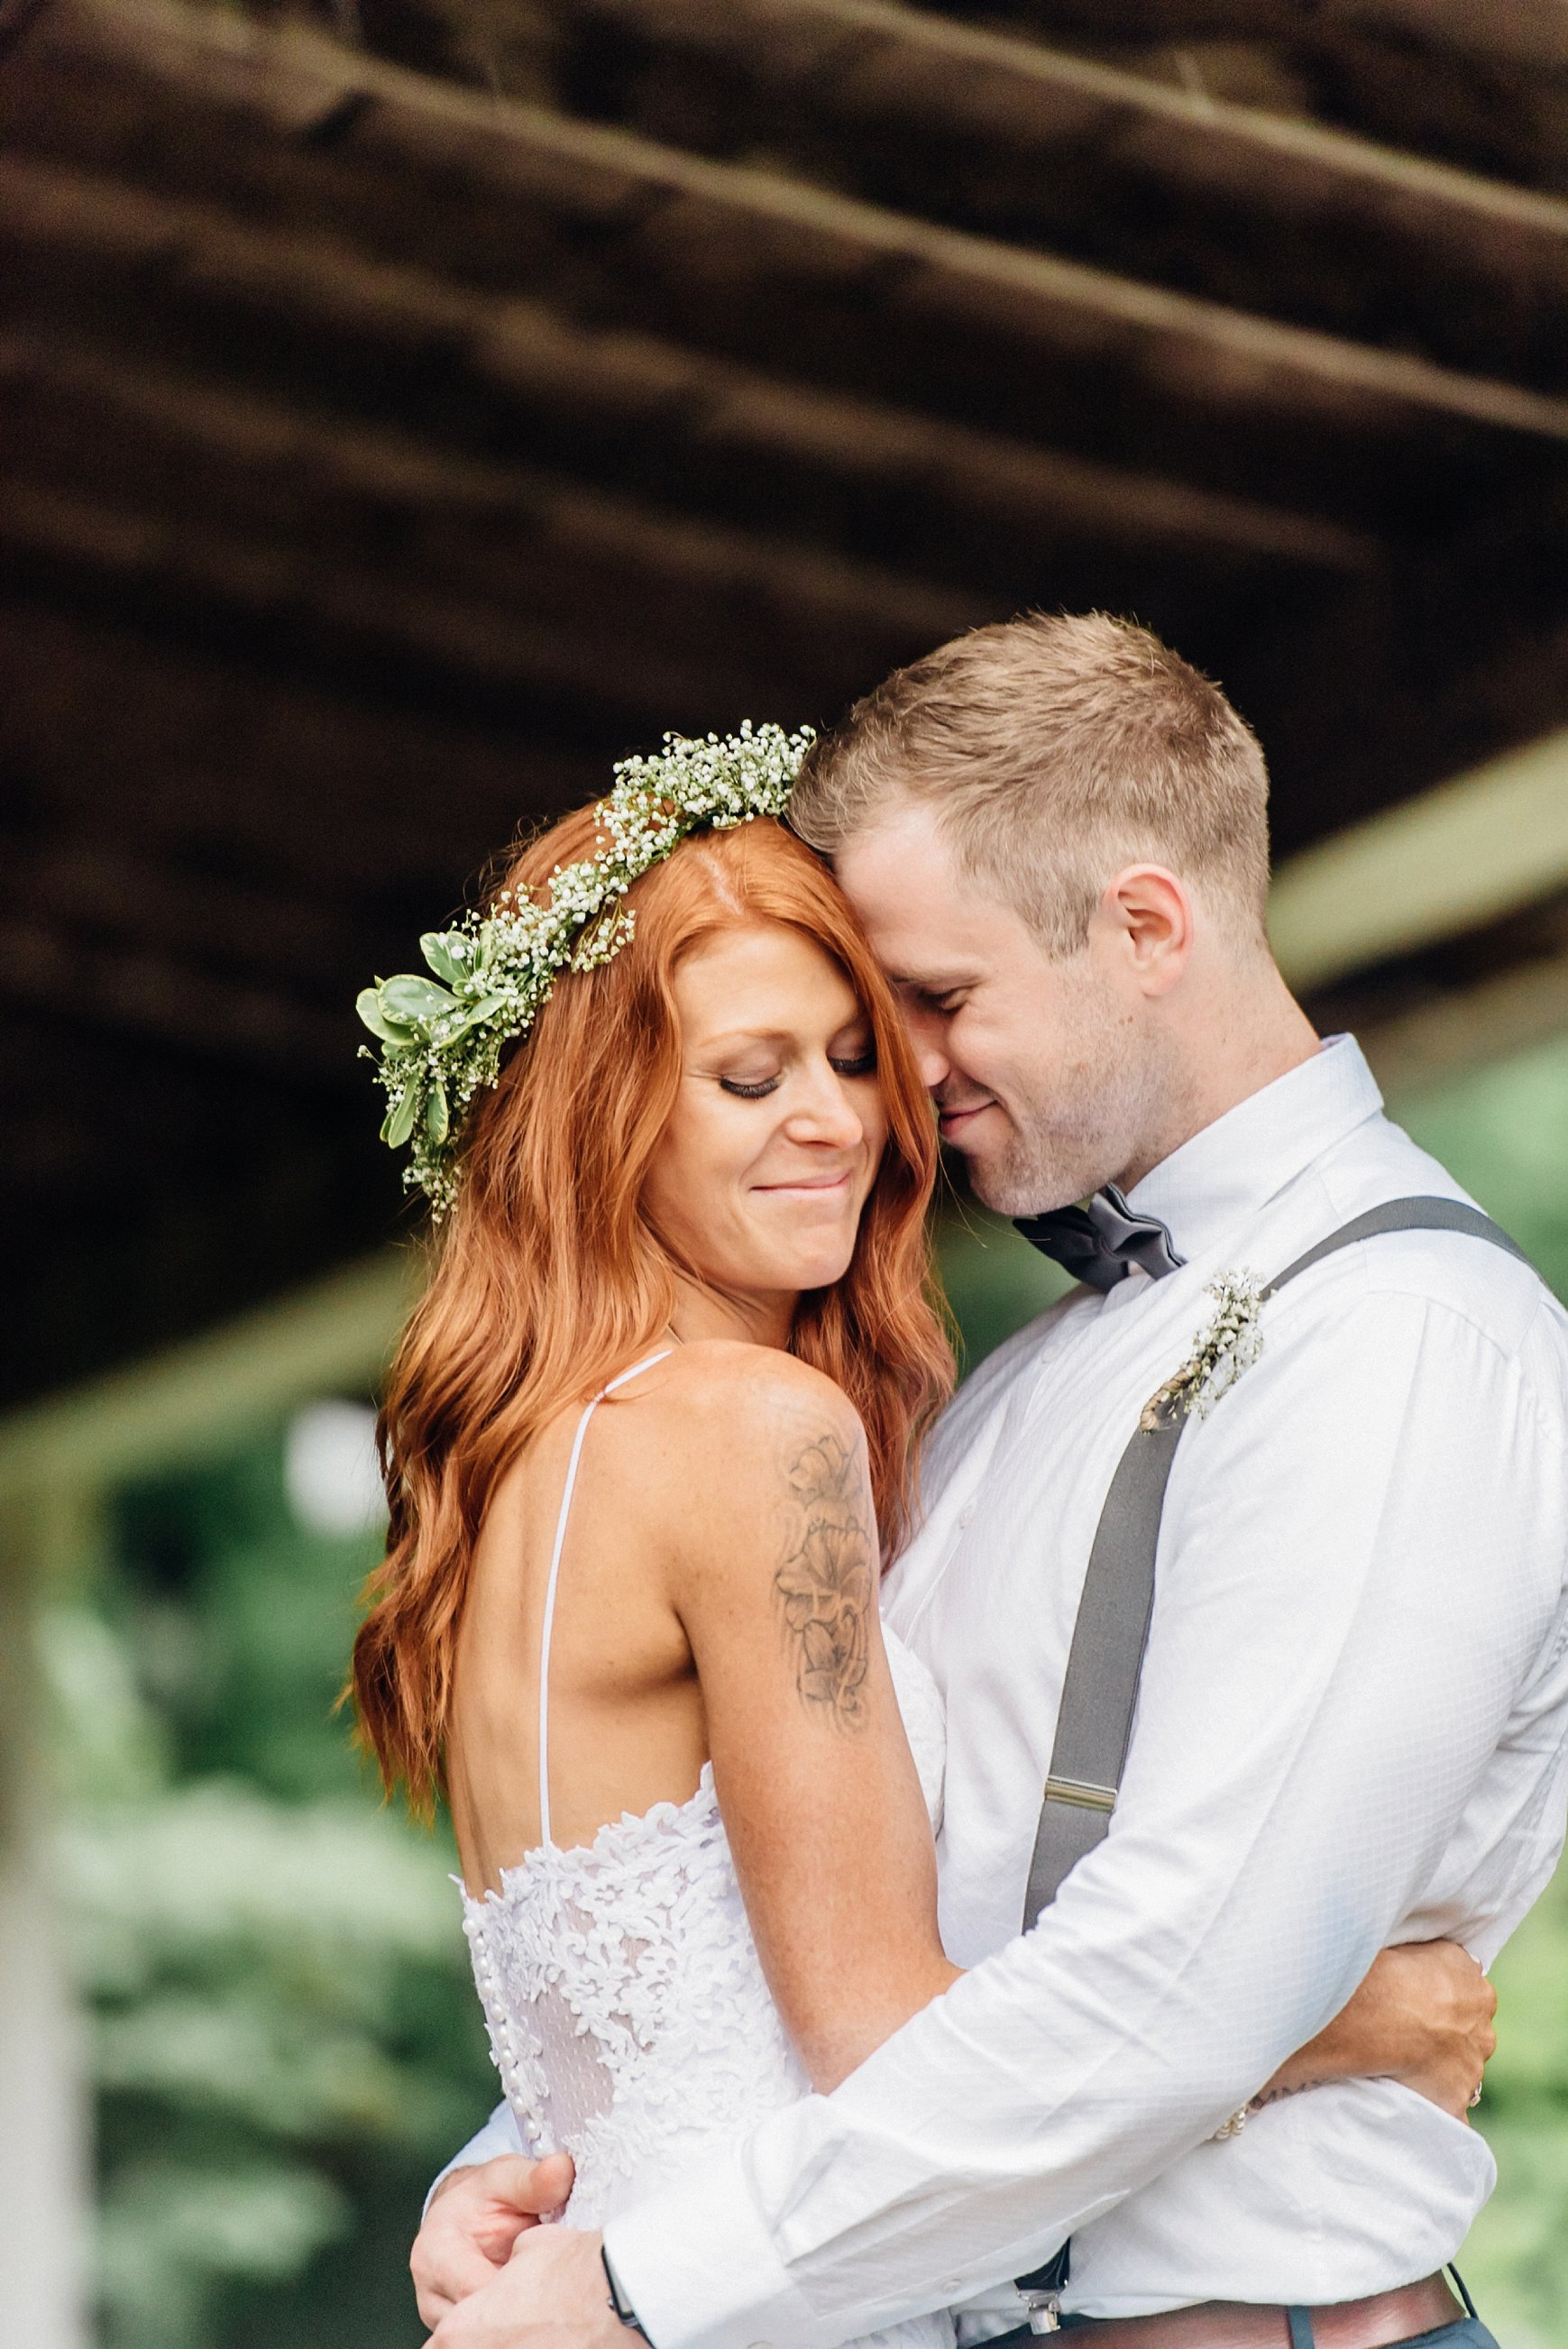 Ottawa Wedding Photographer - Stanley's Olde Maple Lane Barn Wedding - Ali & Batoul Photography_0052.jpg